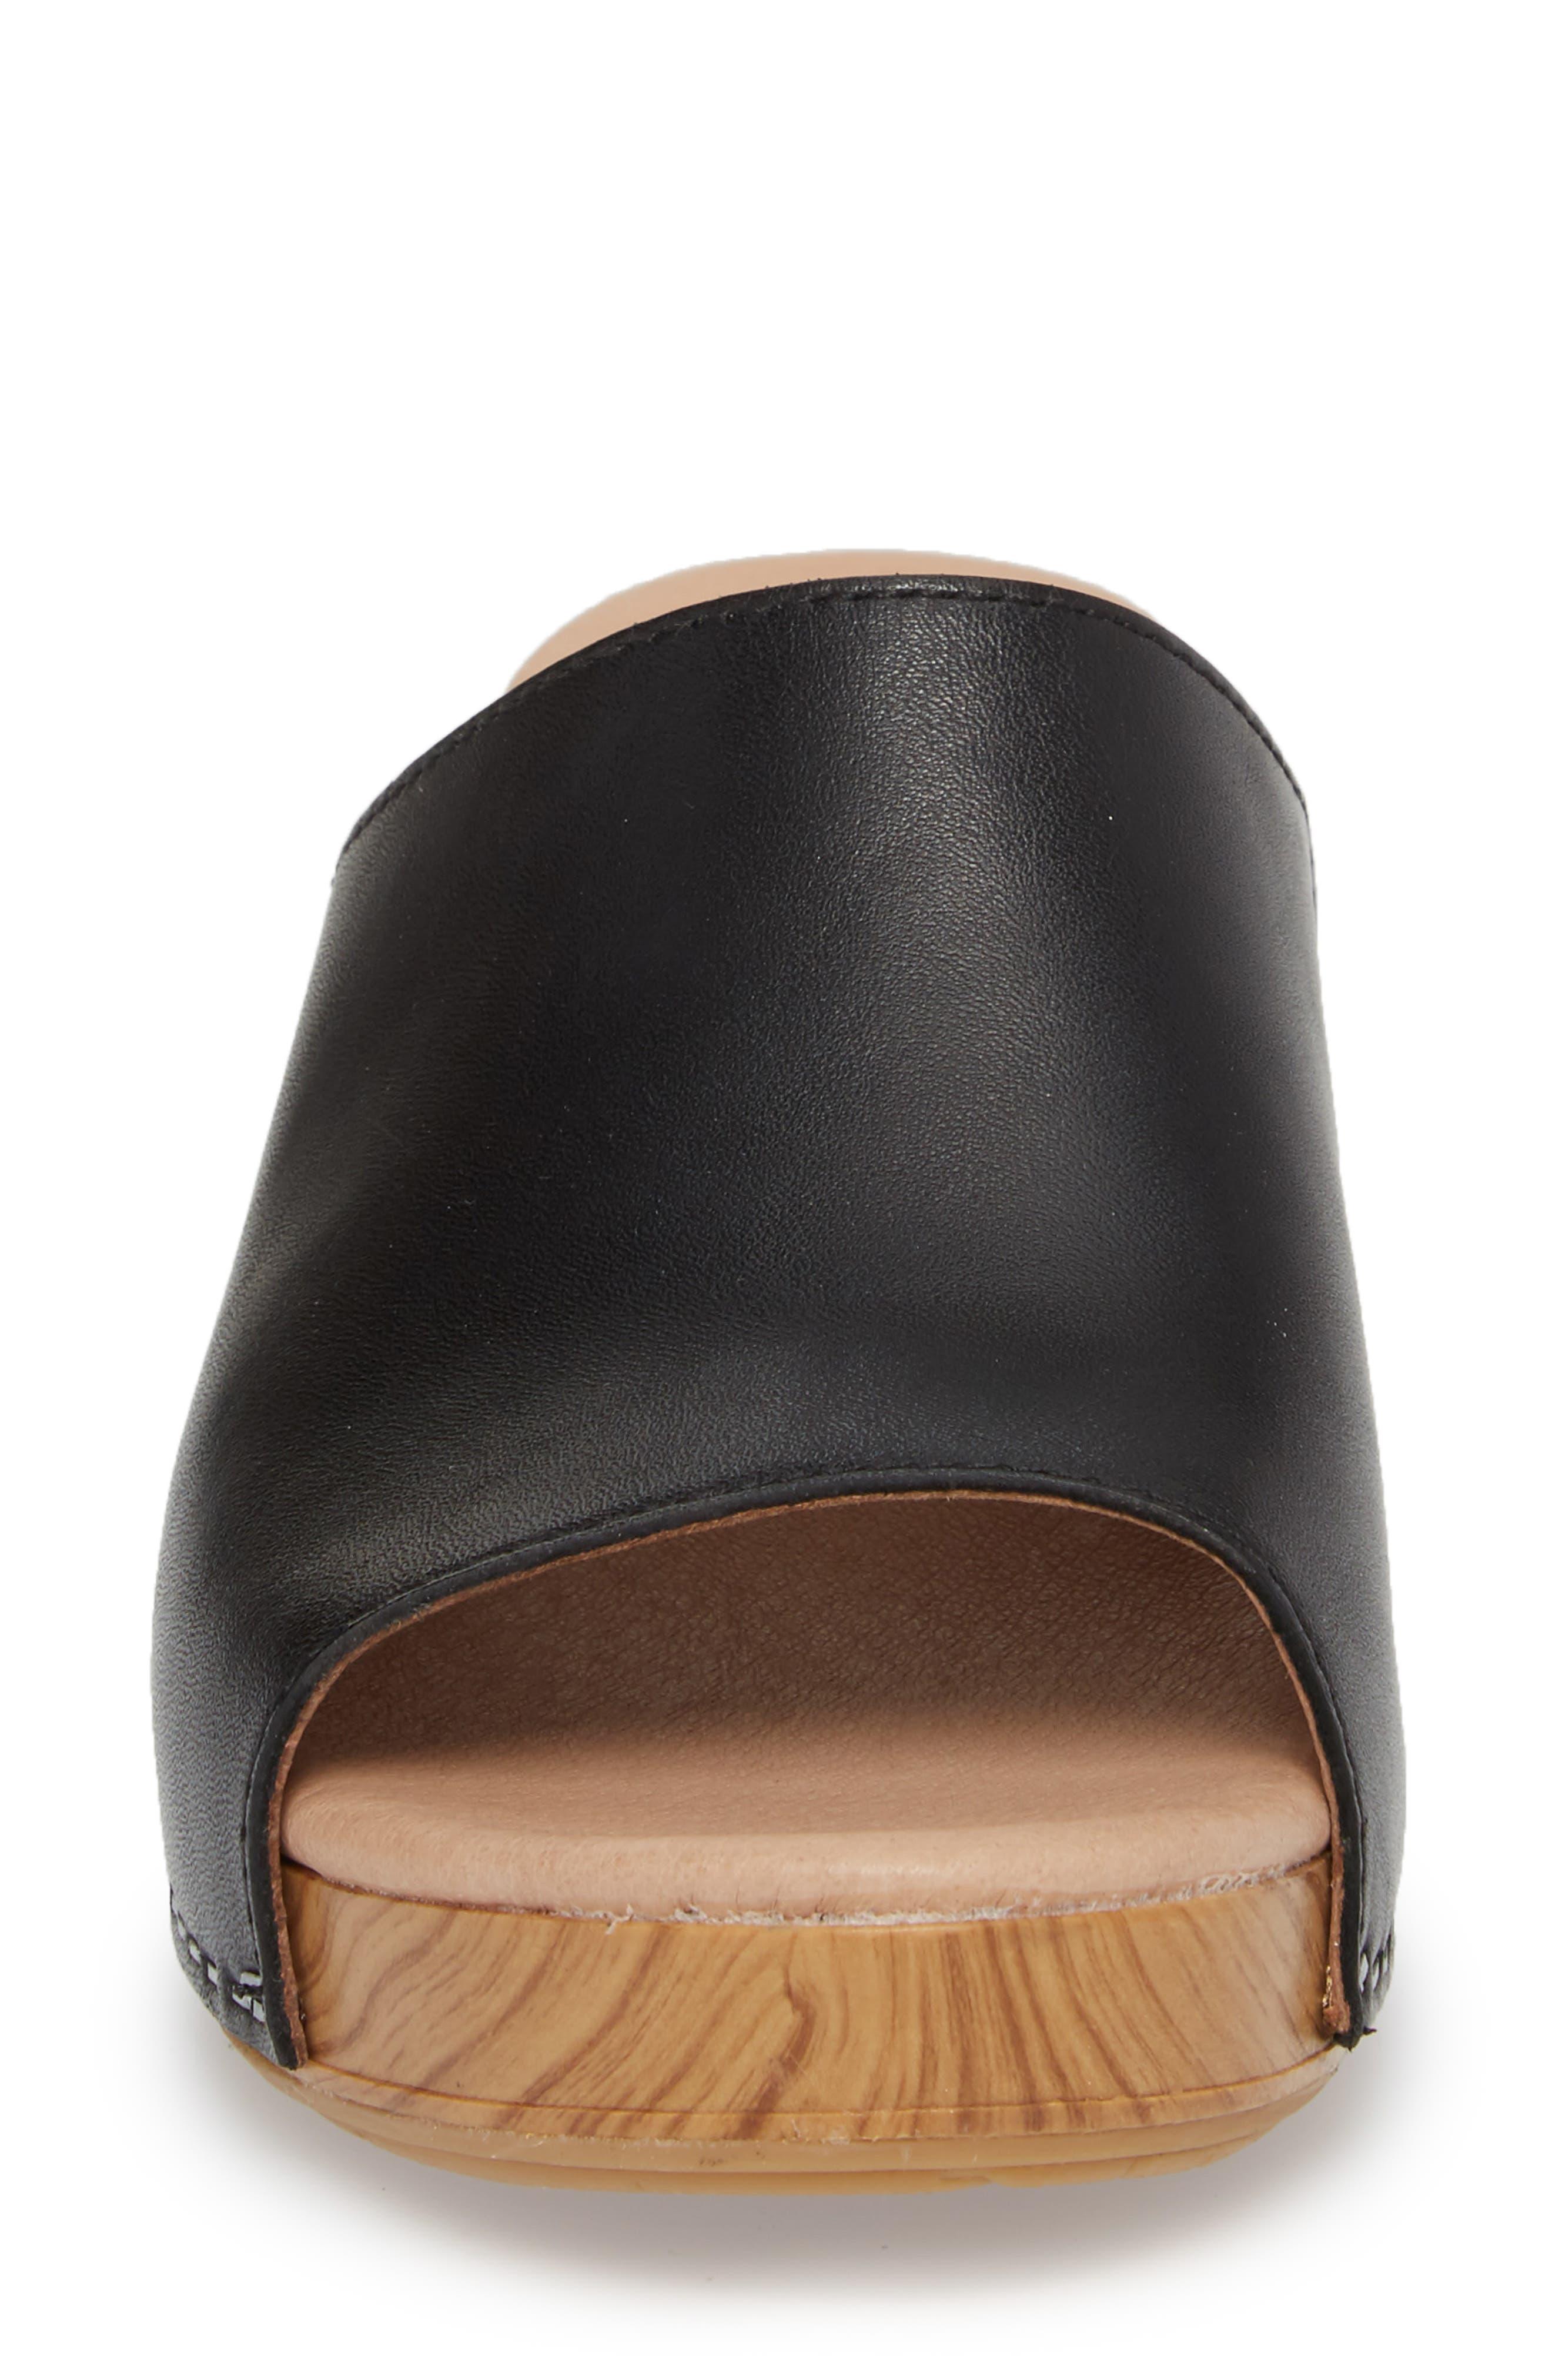 DANSKO, Maci Mule Sandal, Alternate thumbnail 4, color, BLACK LEATHER